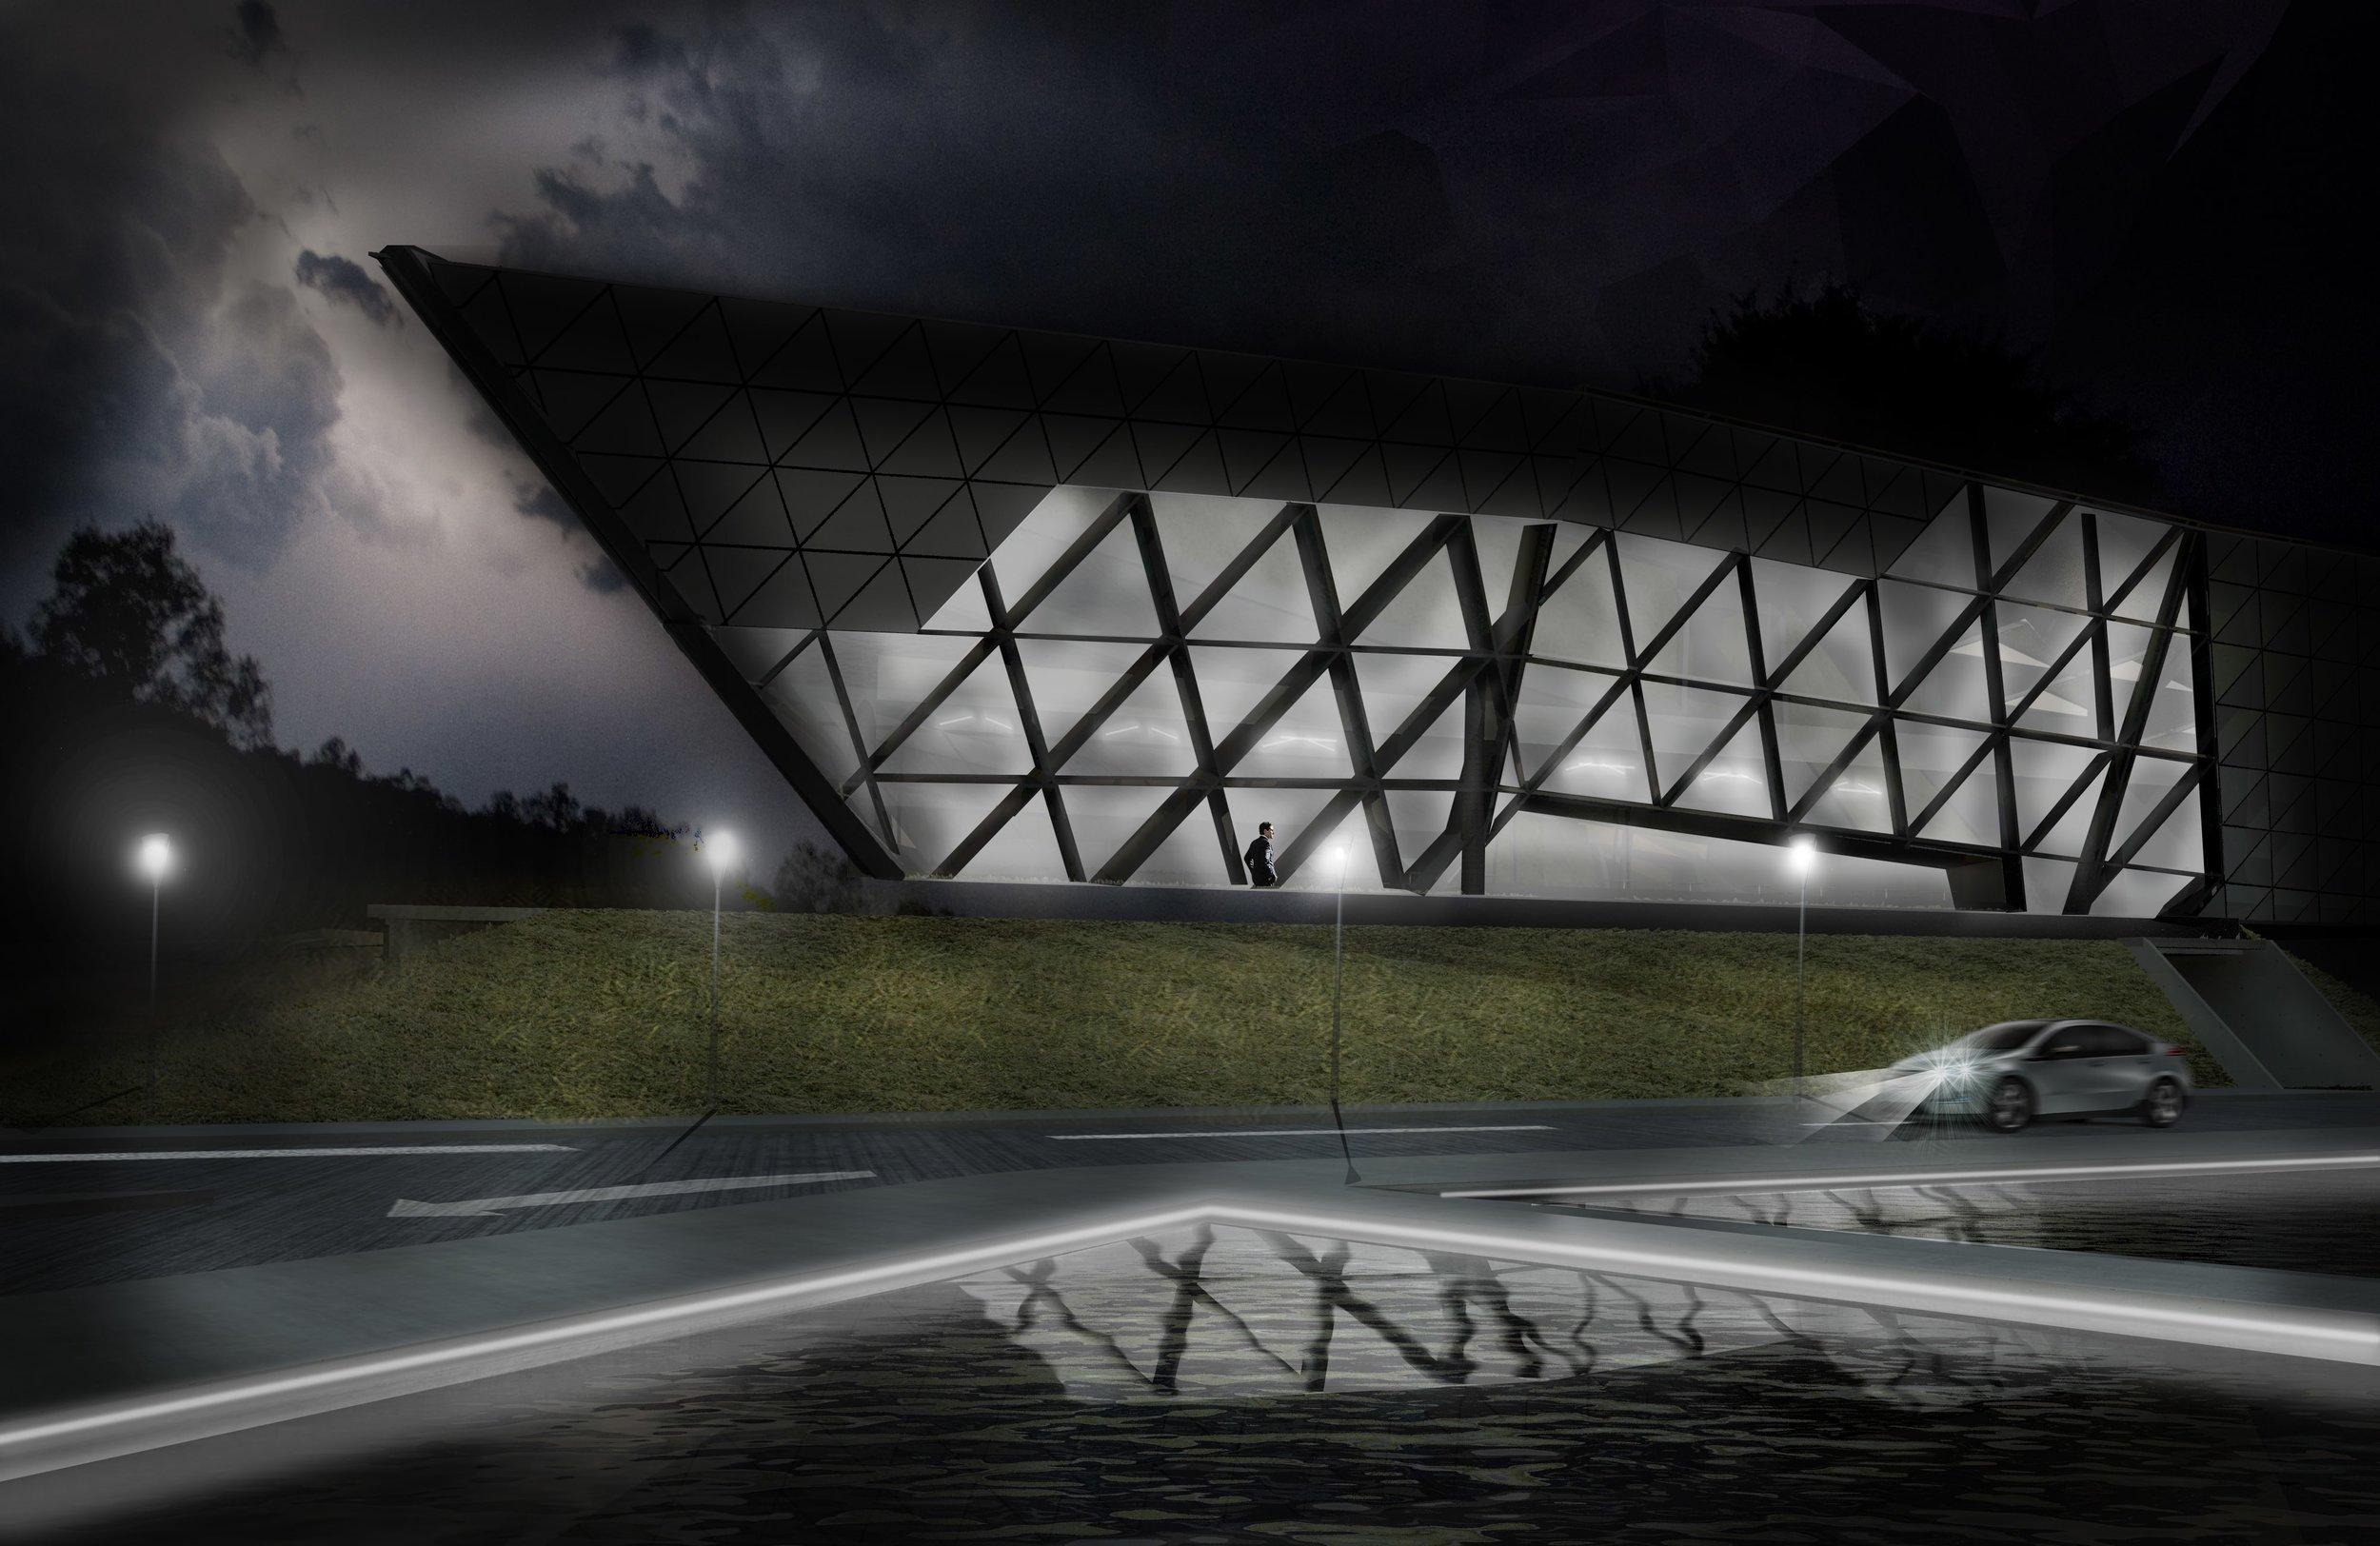 18-render-texcoco-train-station-night-min.jpg